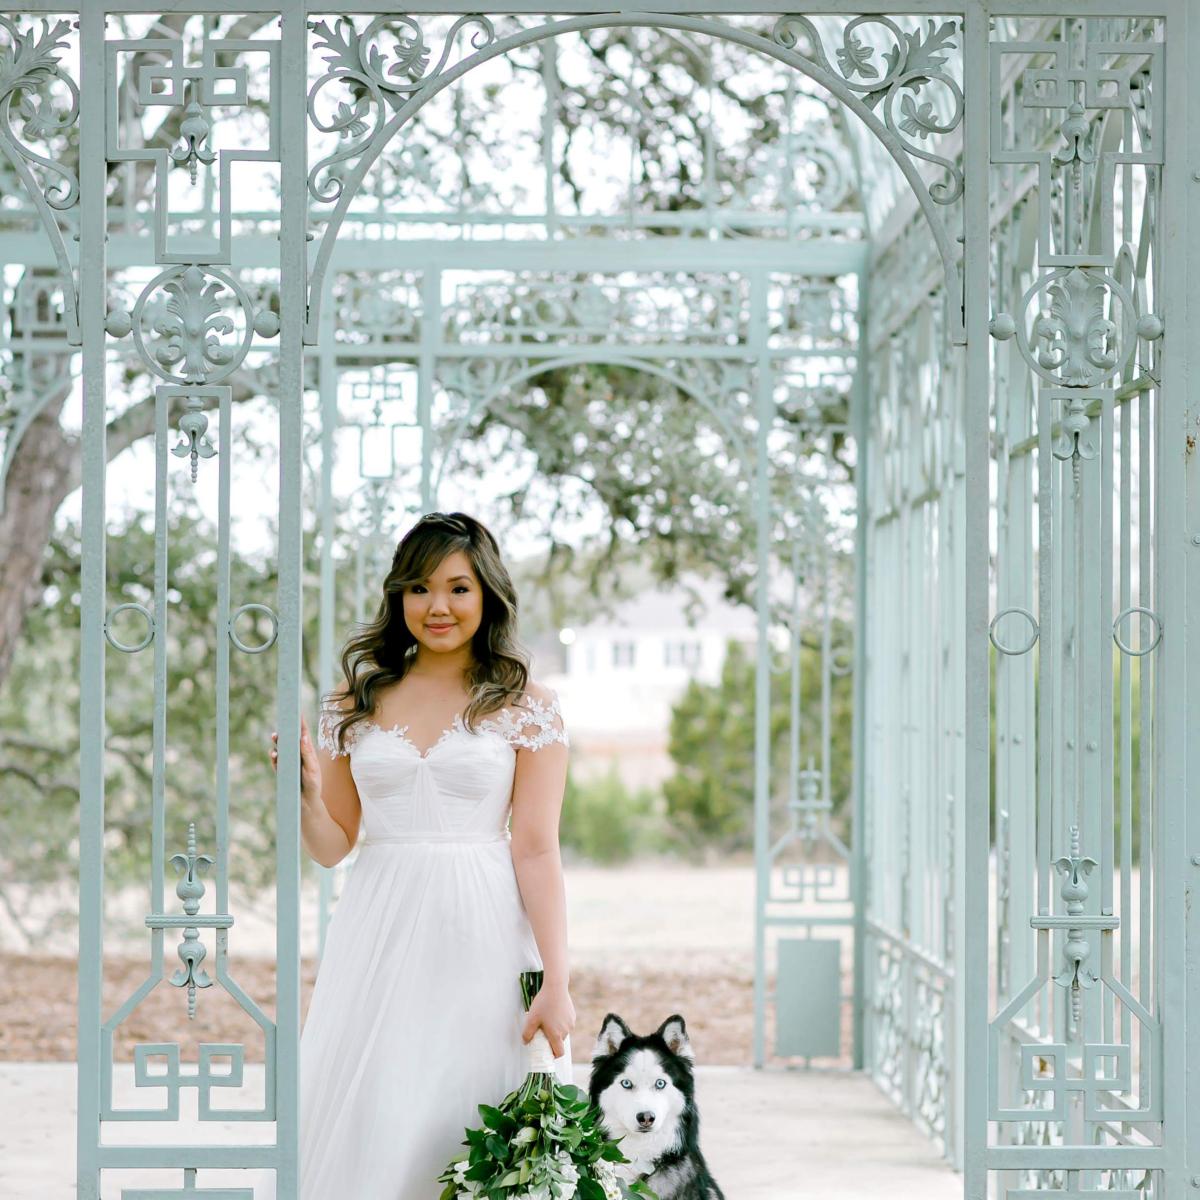 Anthony Luong and Kimberly Kim wedding